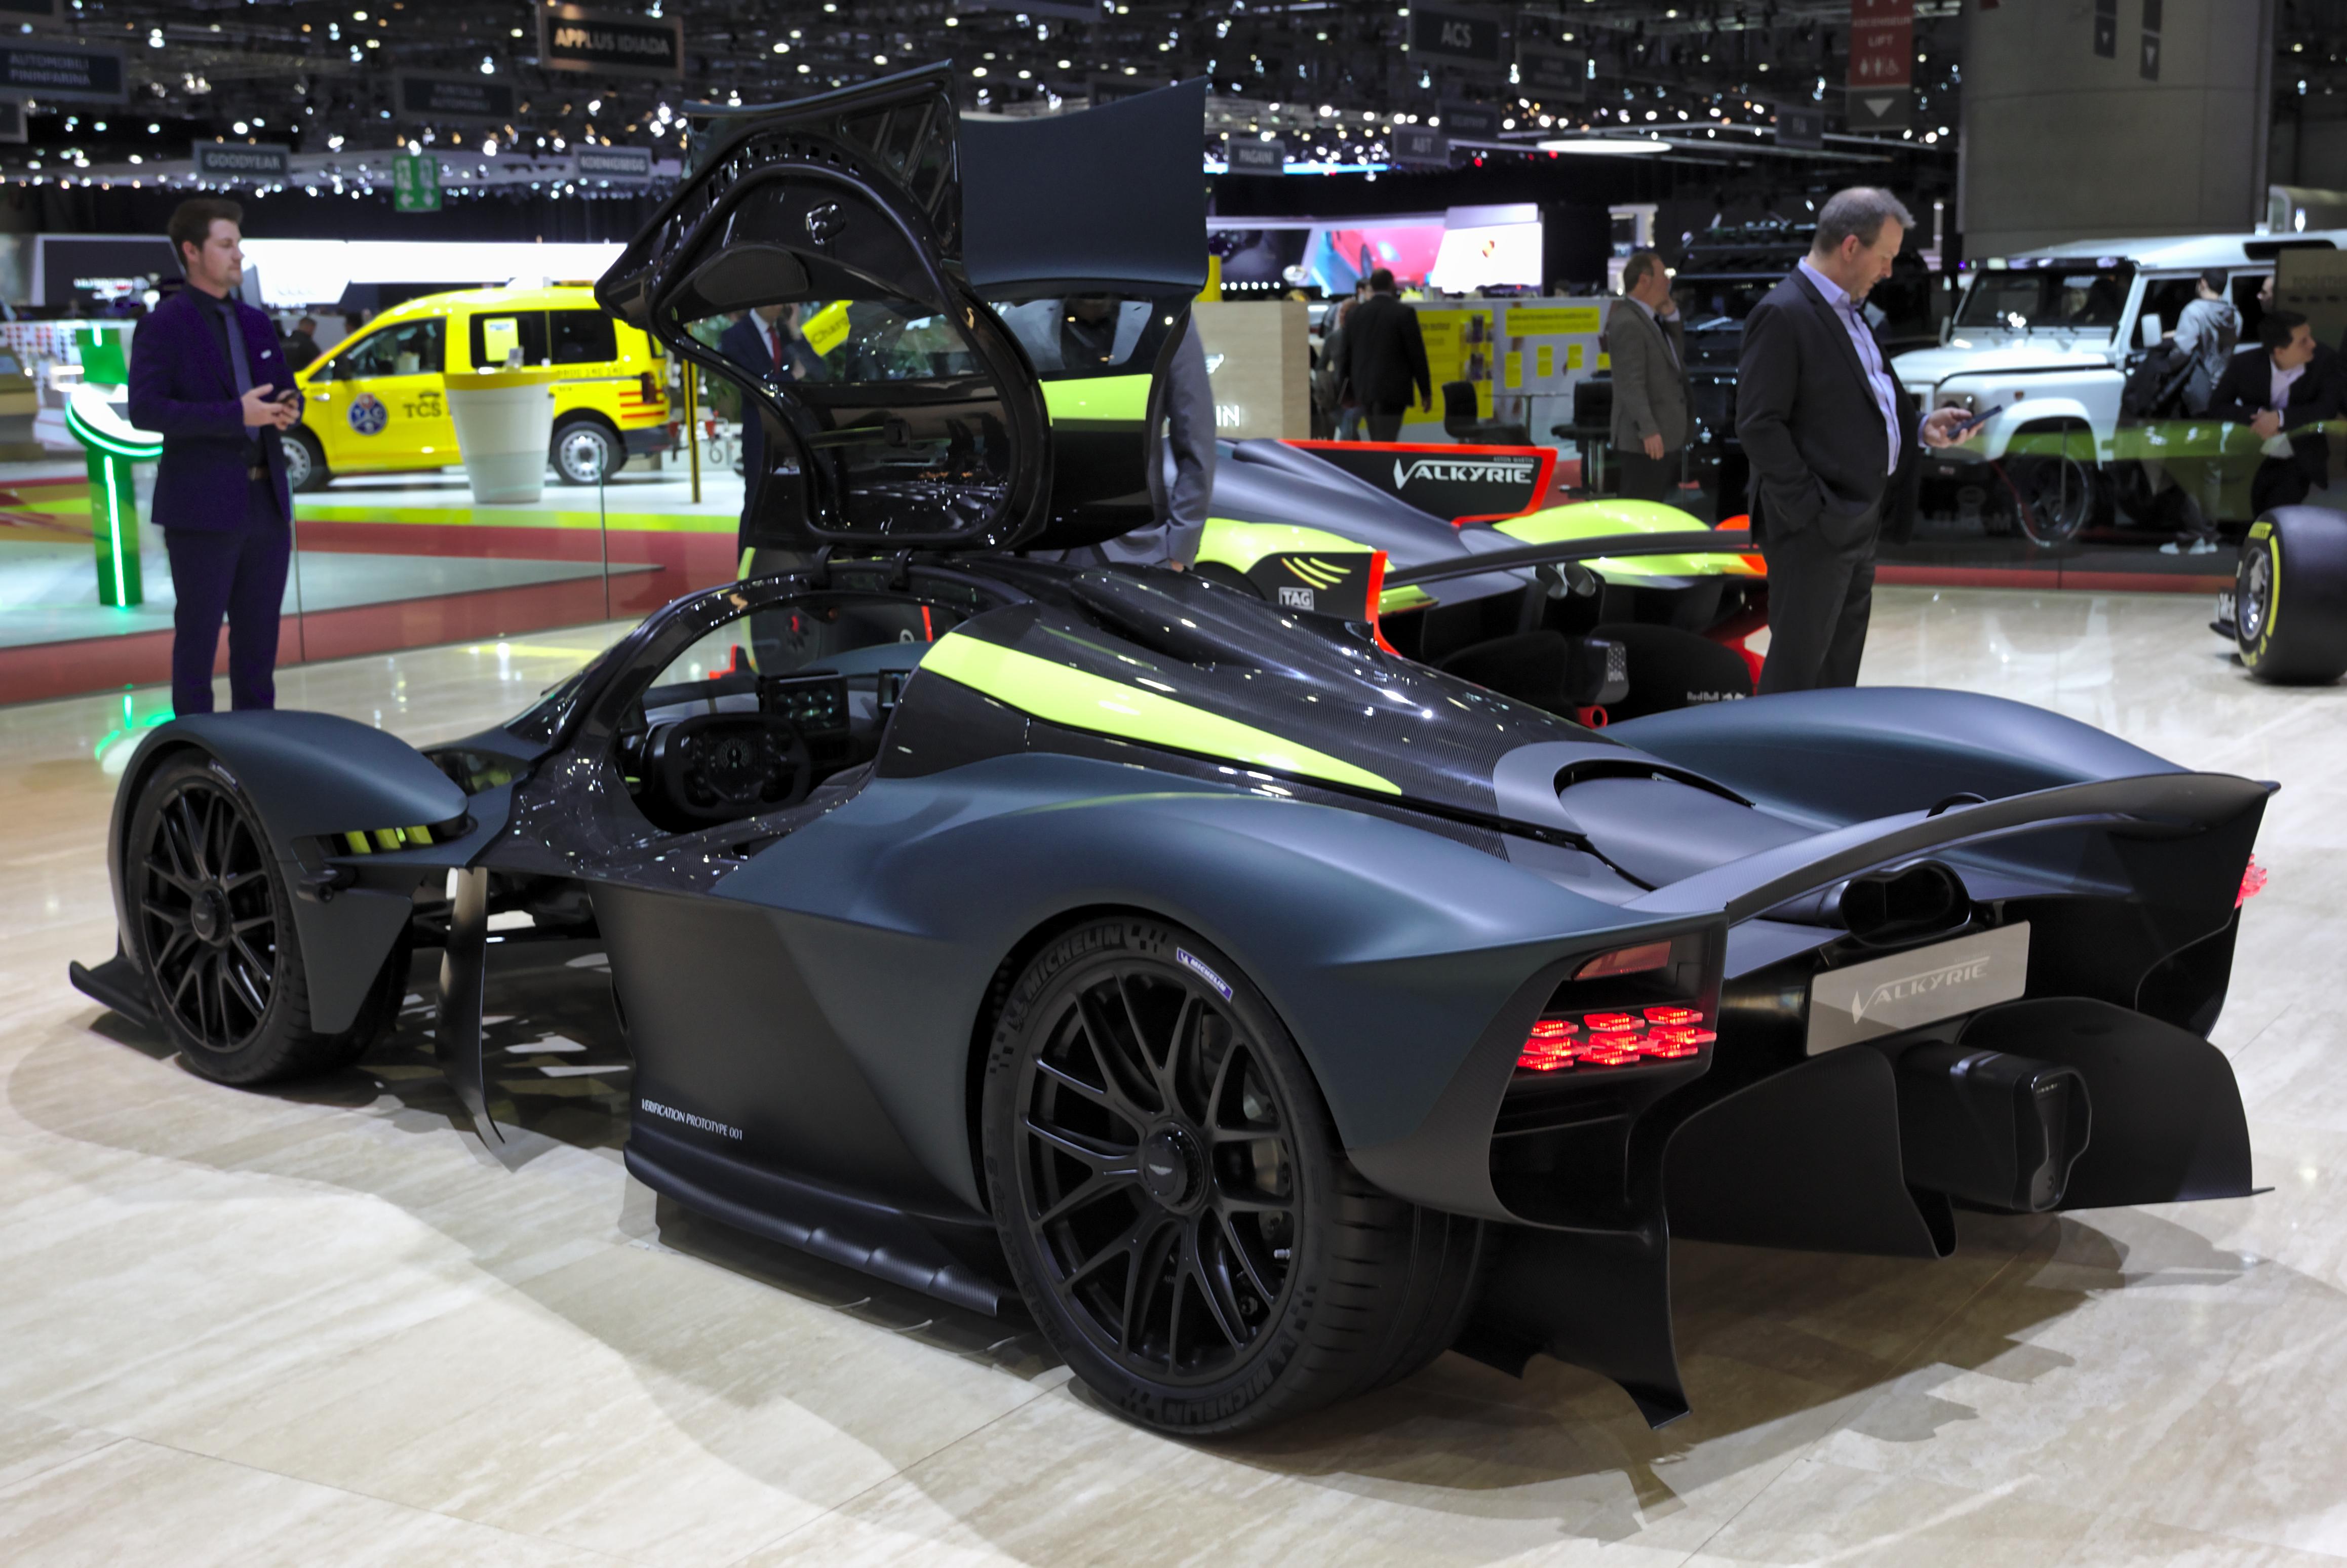 Datei Aston Martin Valkyrie Verification Prototype 001 Genf 2019 1y7a5961 Jpg Wikipedia